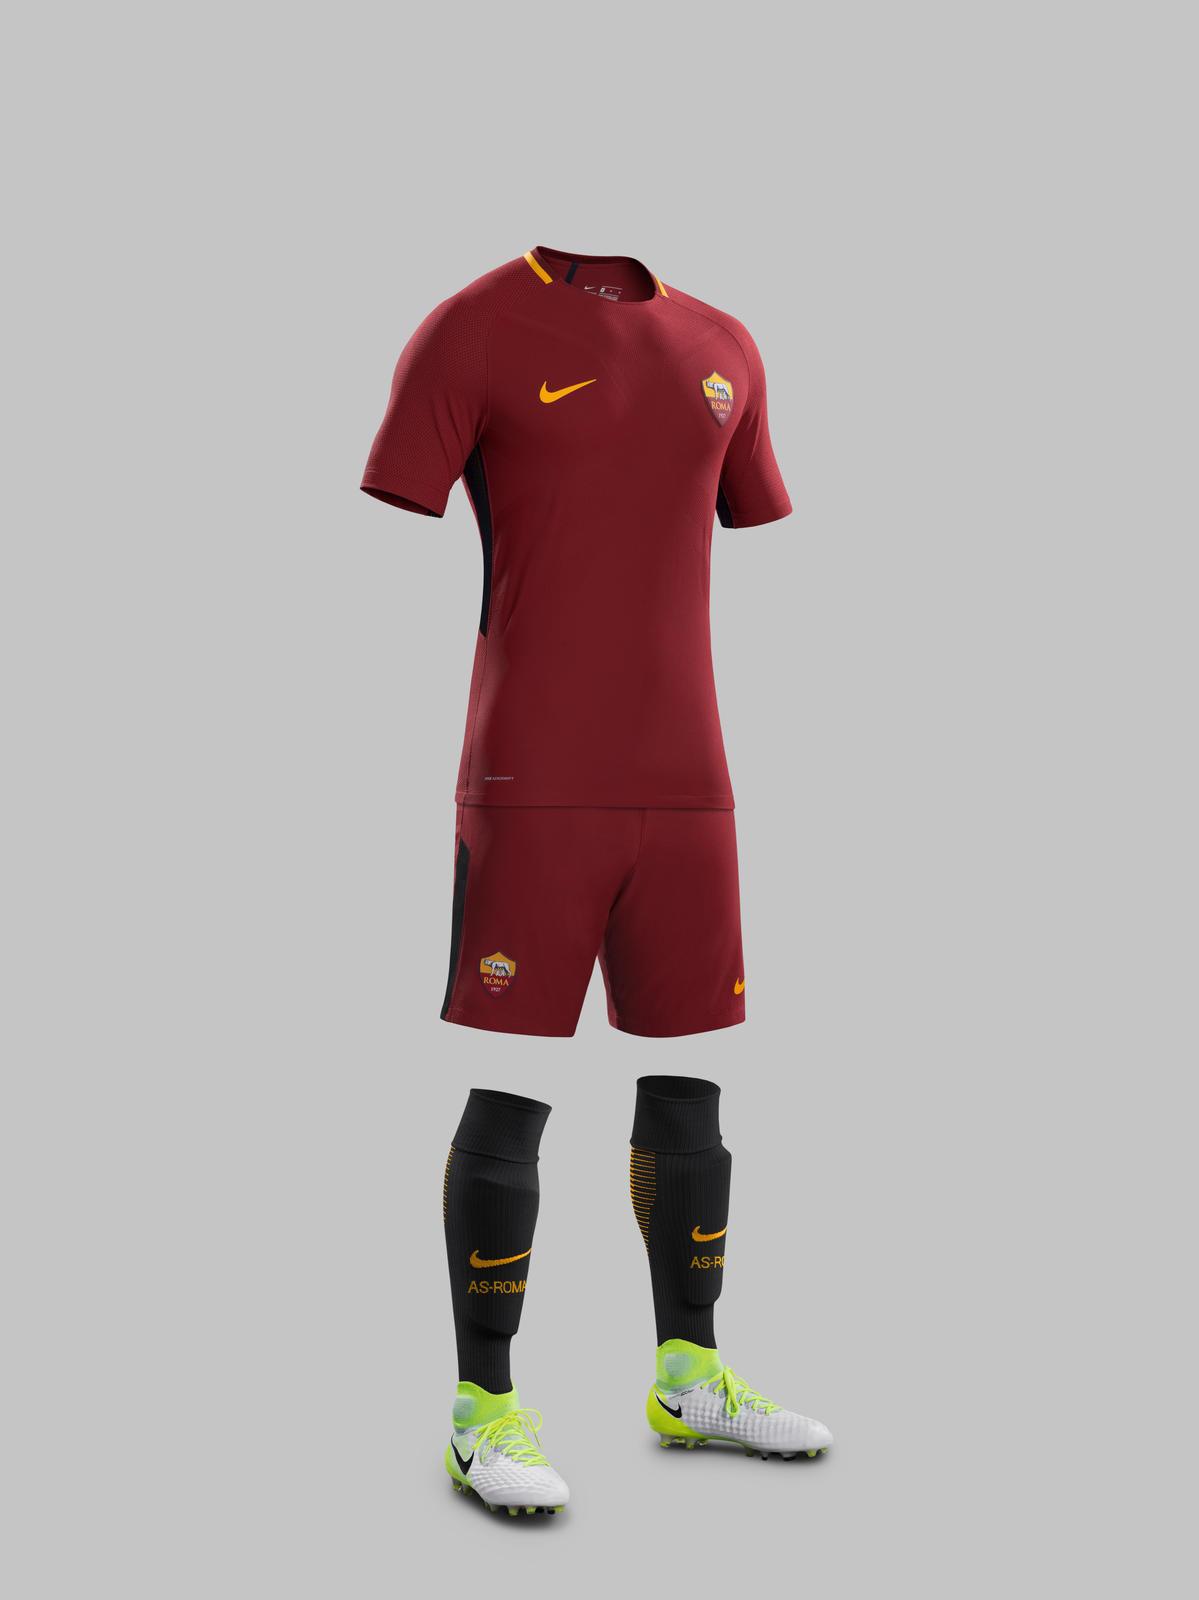 AS Roma Home Kit 2017-18